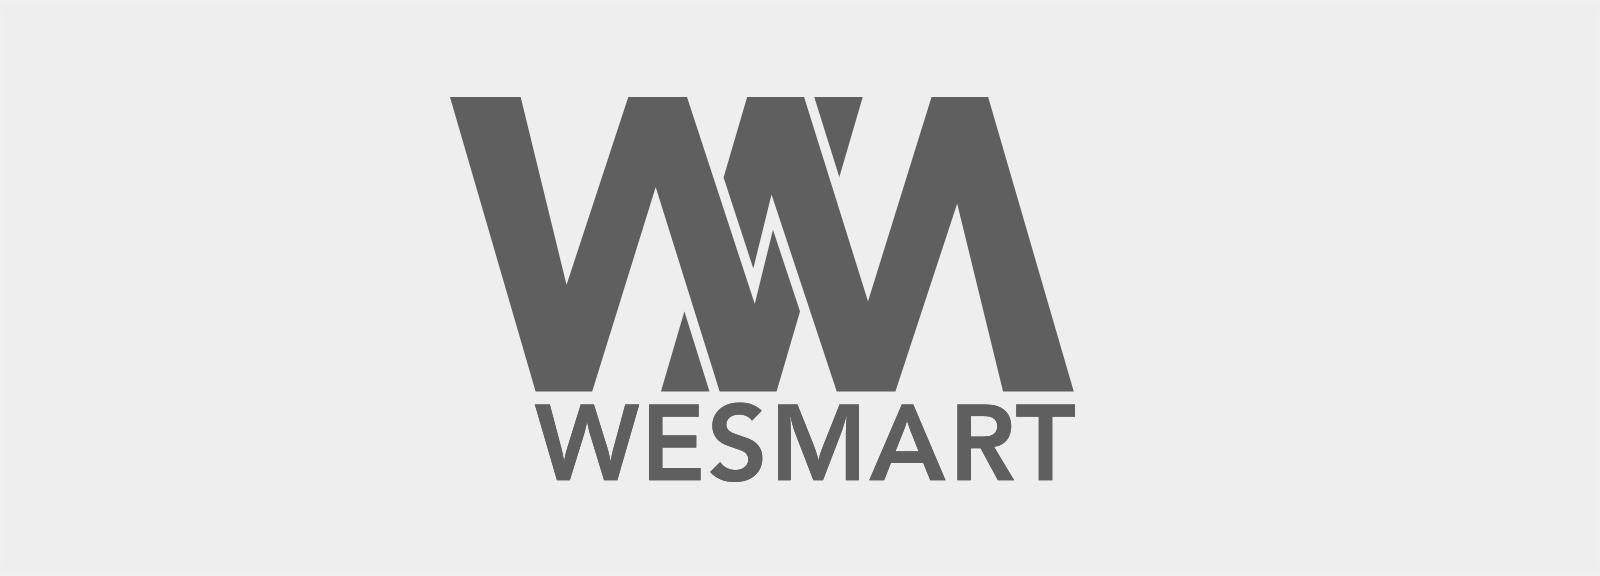 Wesmart-hover